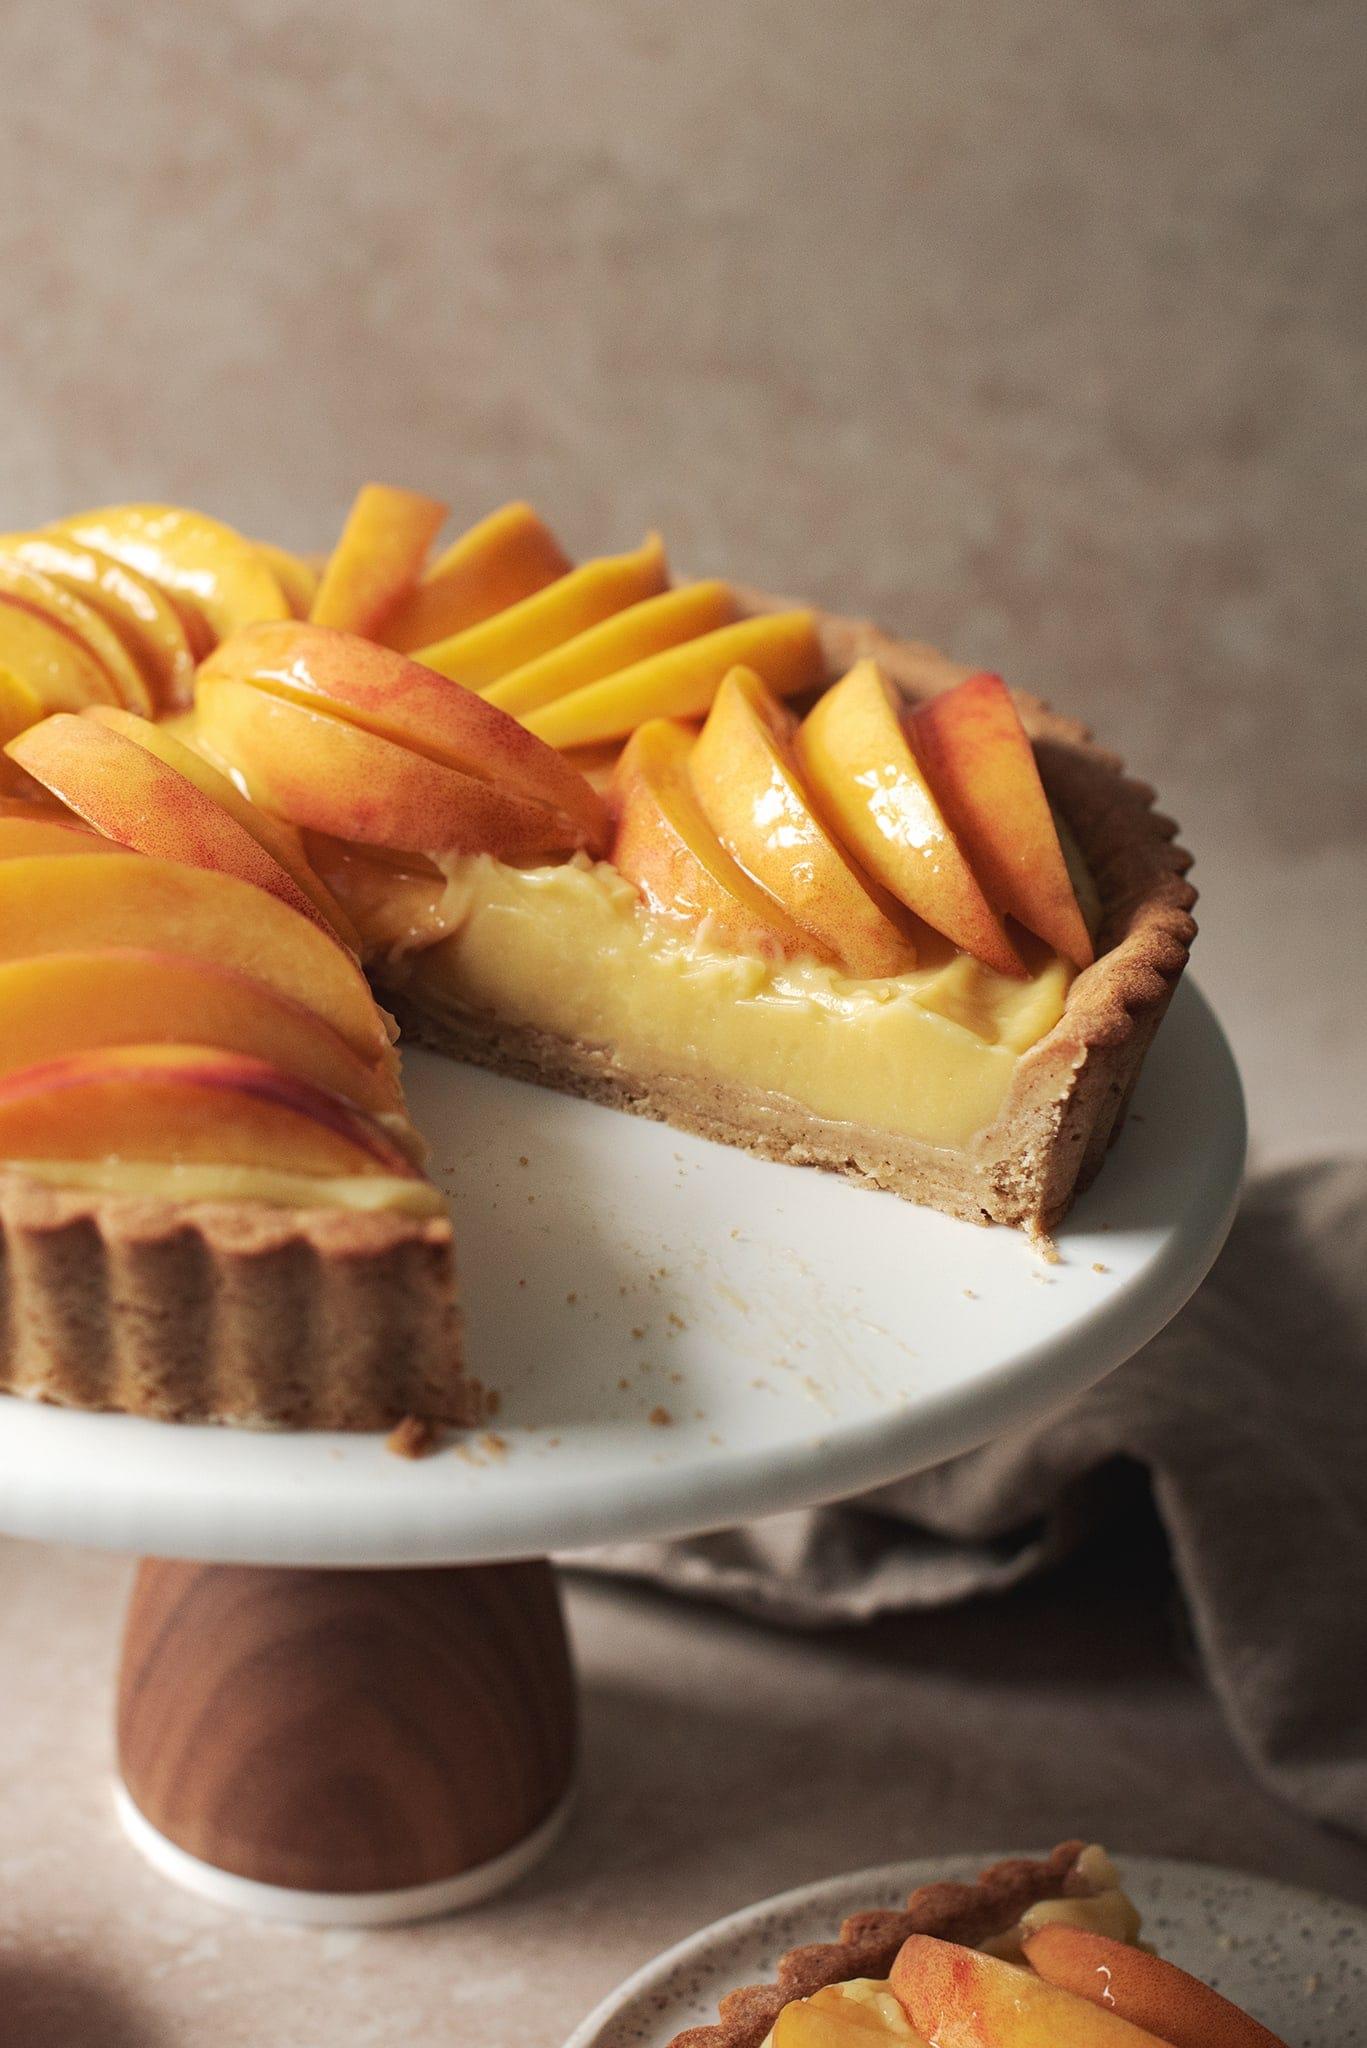 Custard pastry cream filling in a peach tart